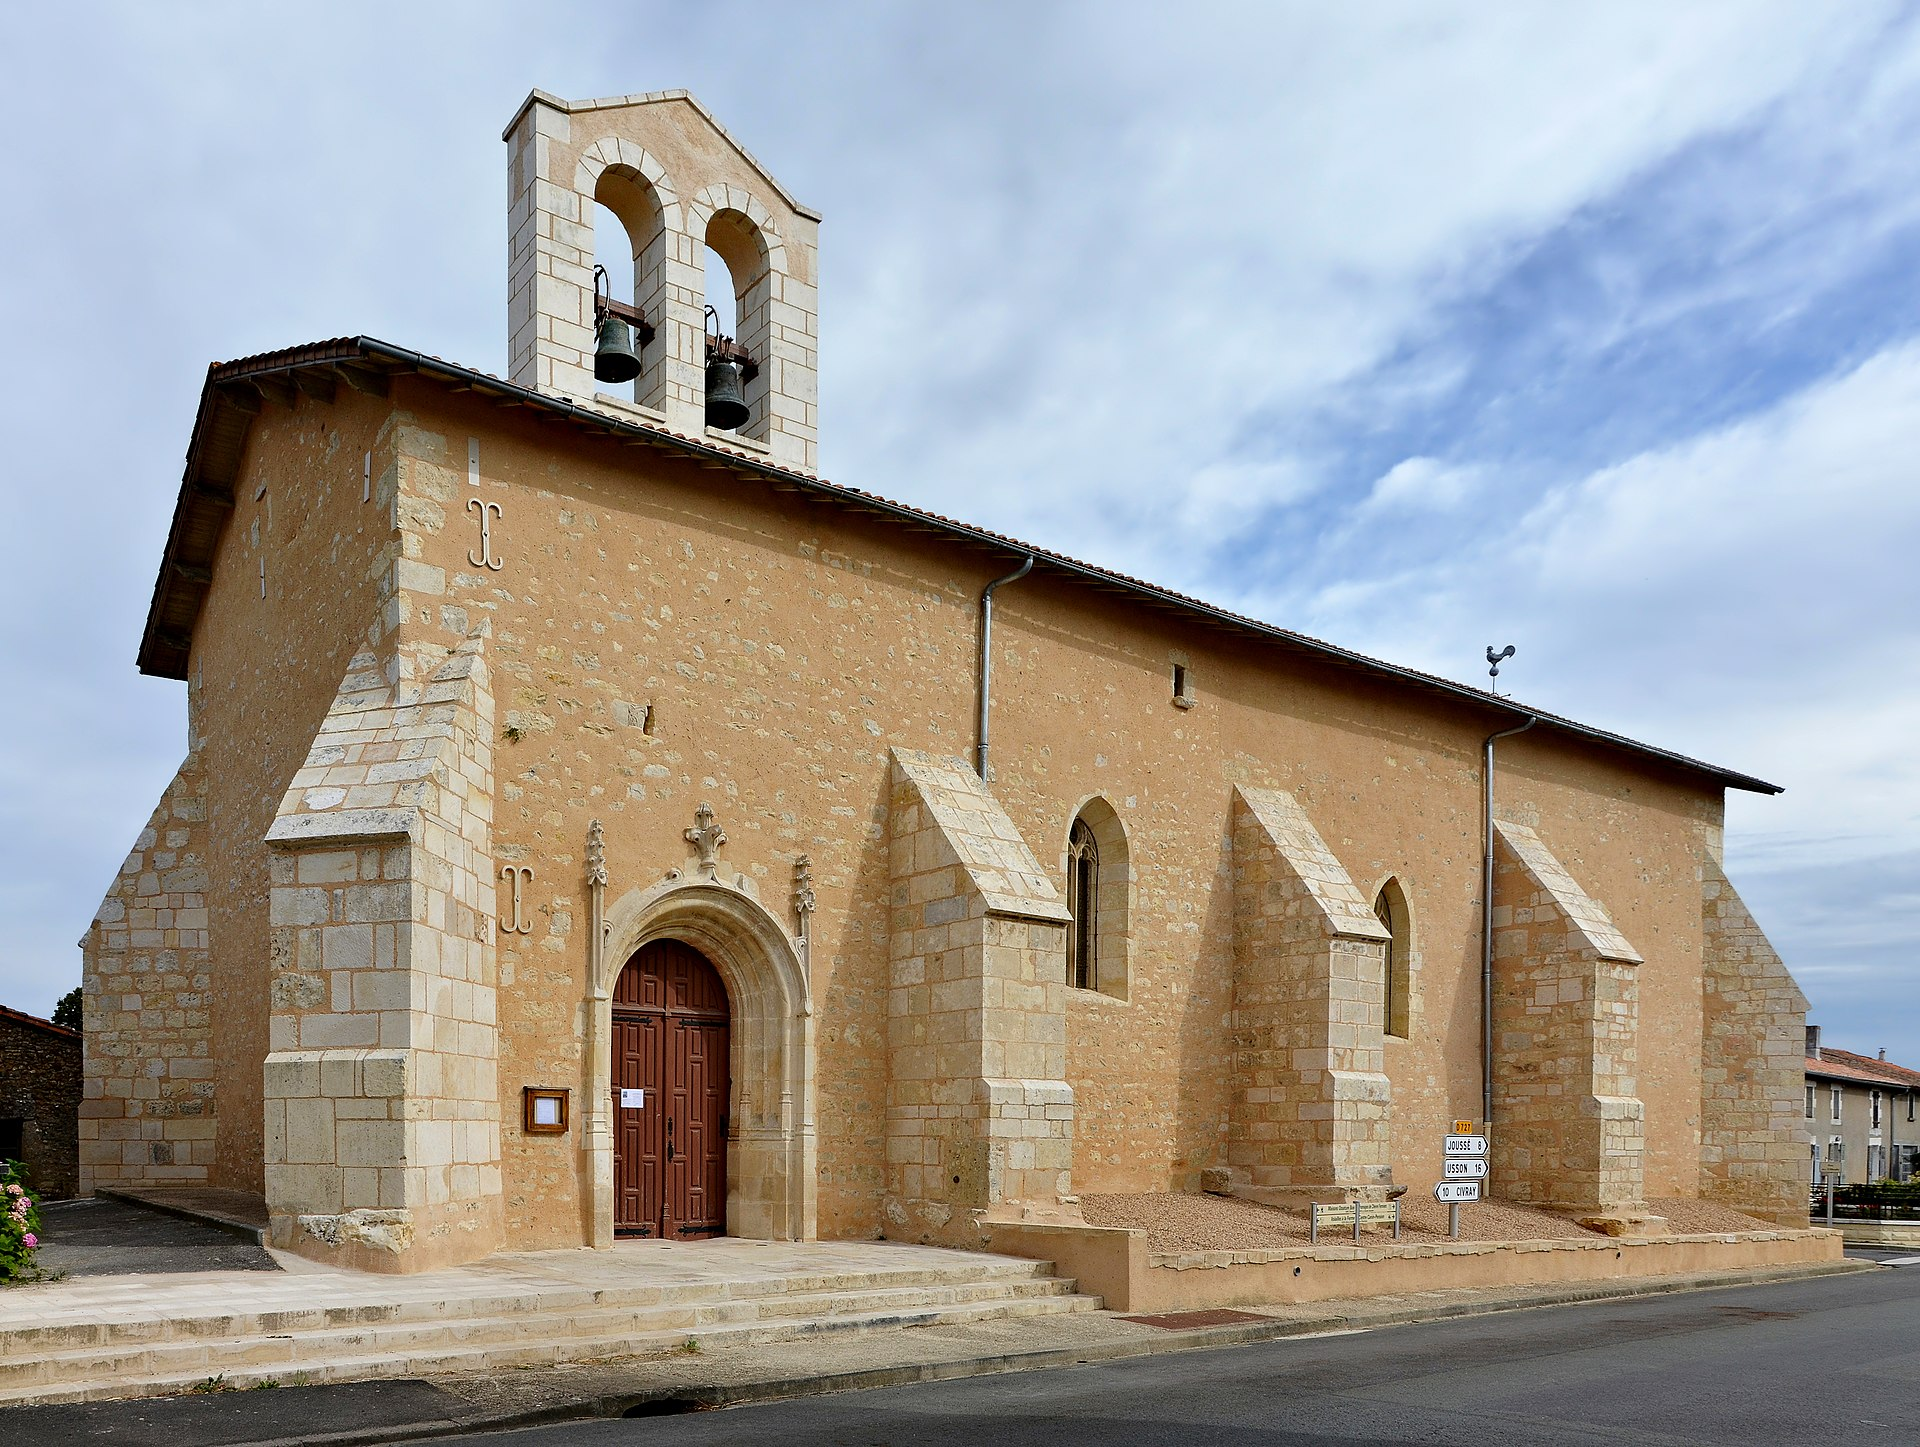 La chapelle b ton vienne wikipedia for Code postal vienne 86